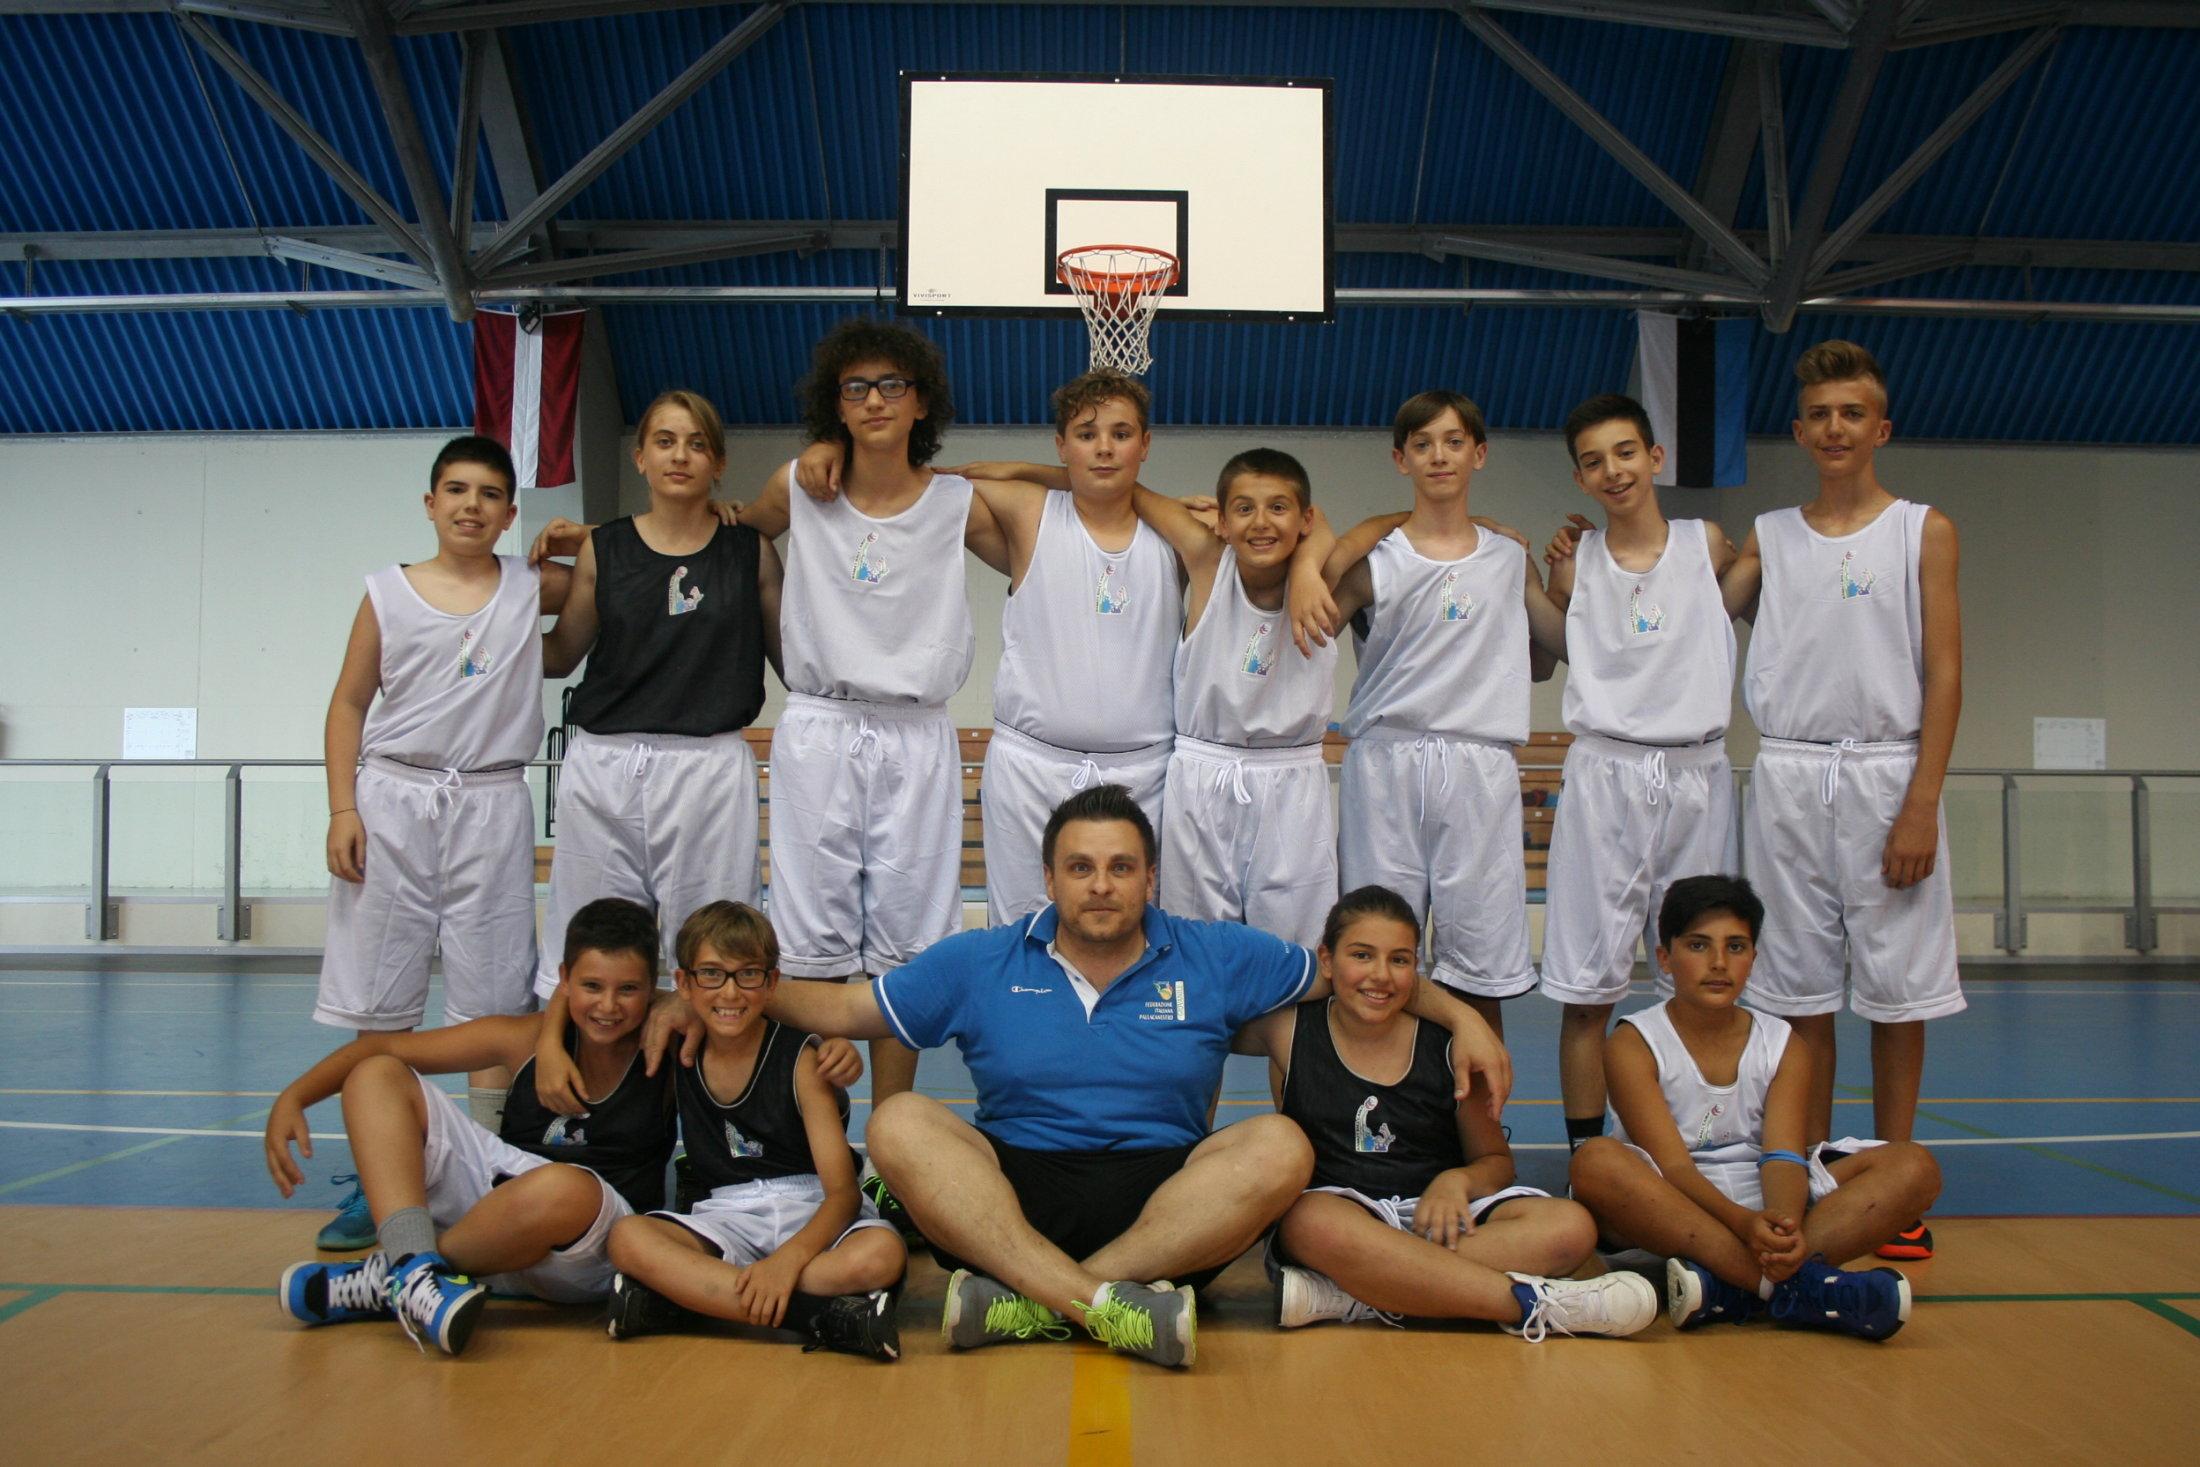 Piancavallo Basket Ball Camp